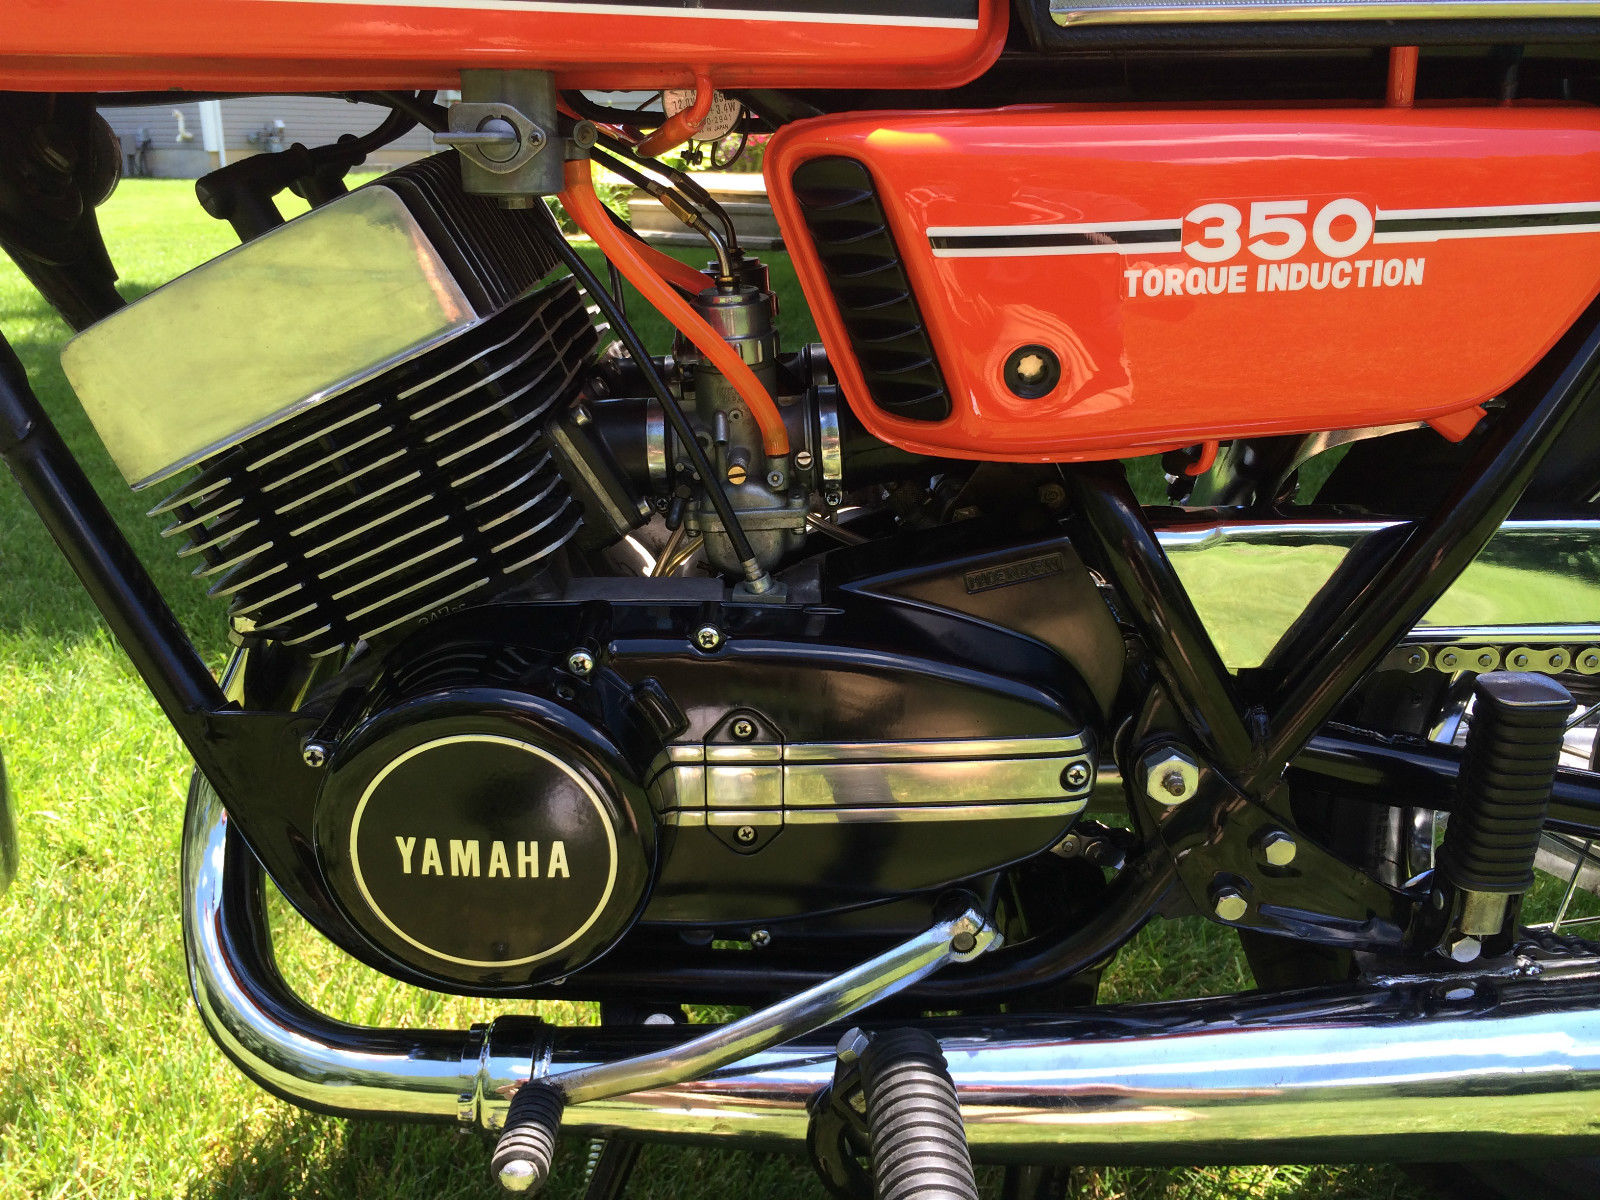 Restored Yamaha RD350 - 1976 Photographs at Classic Bikes